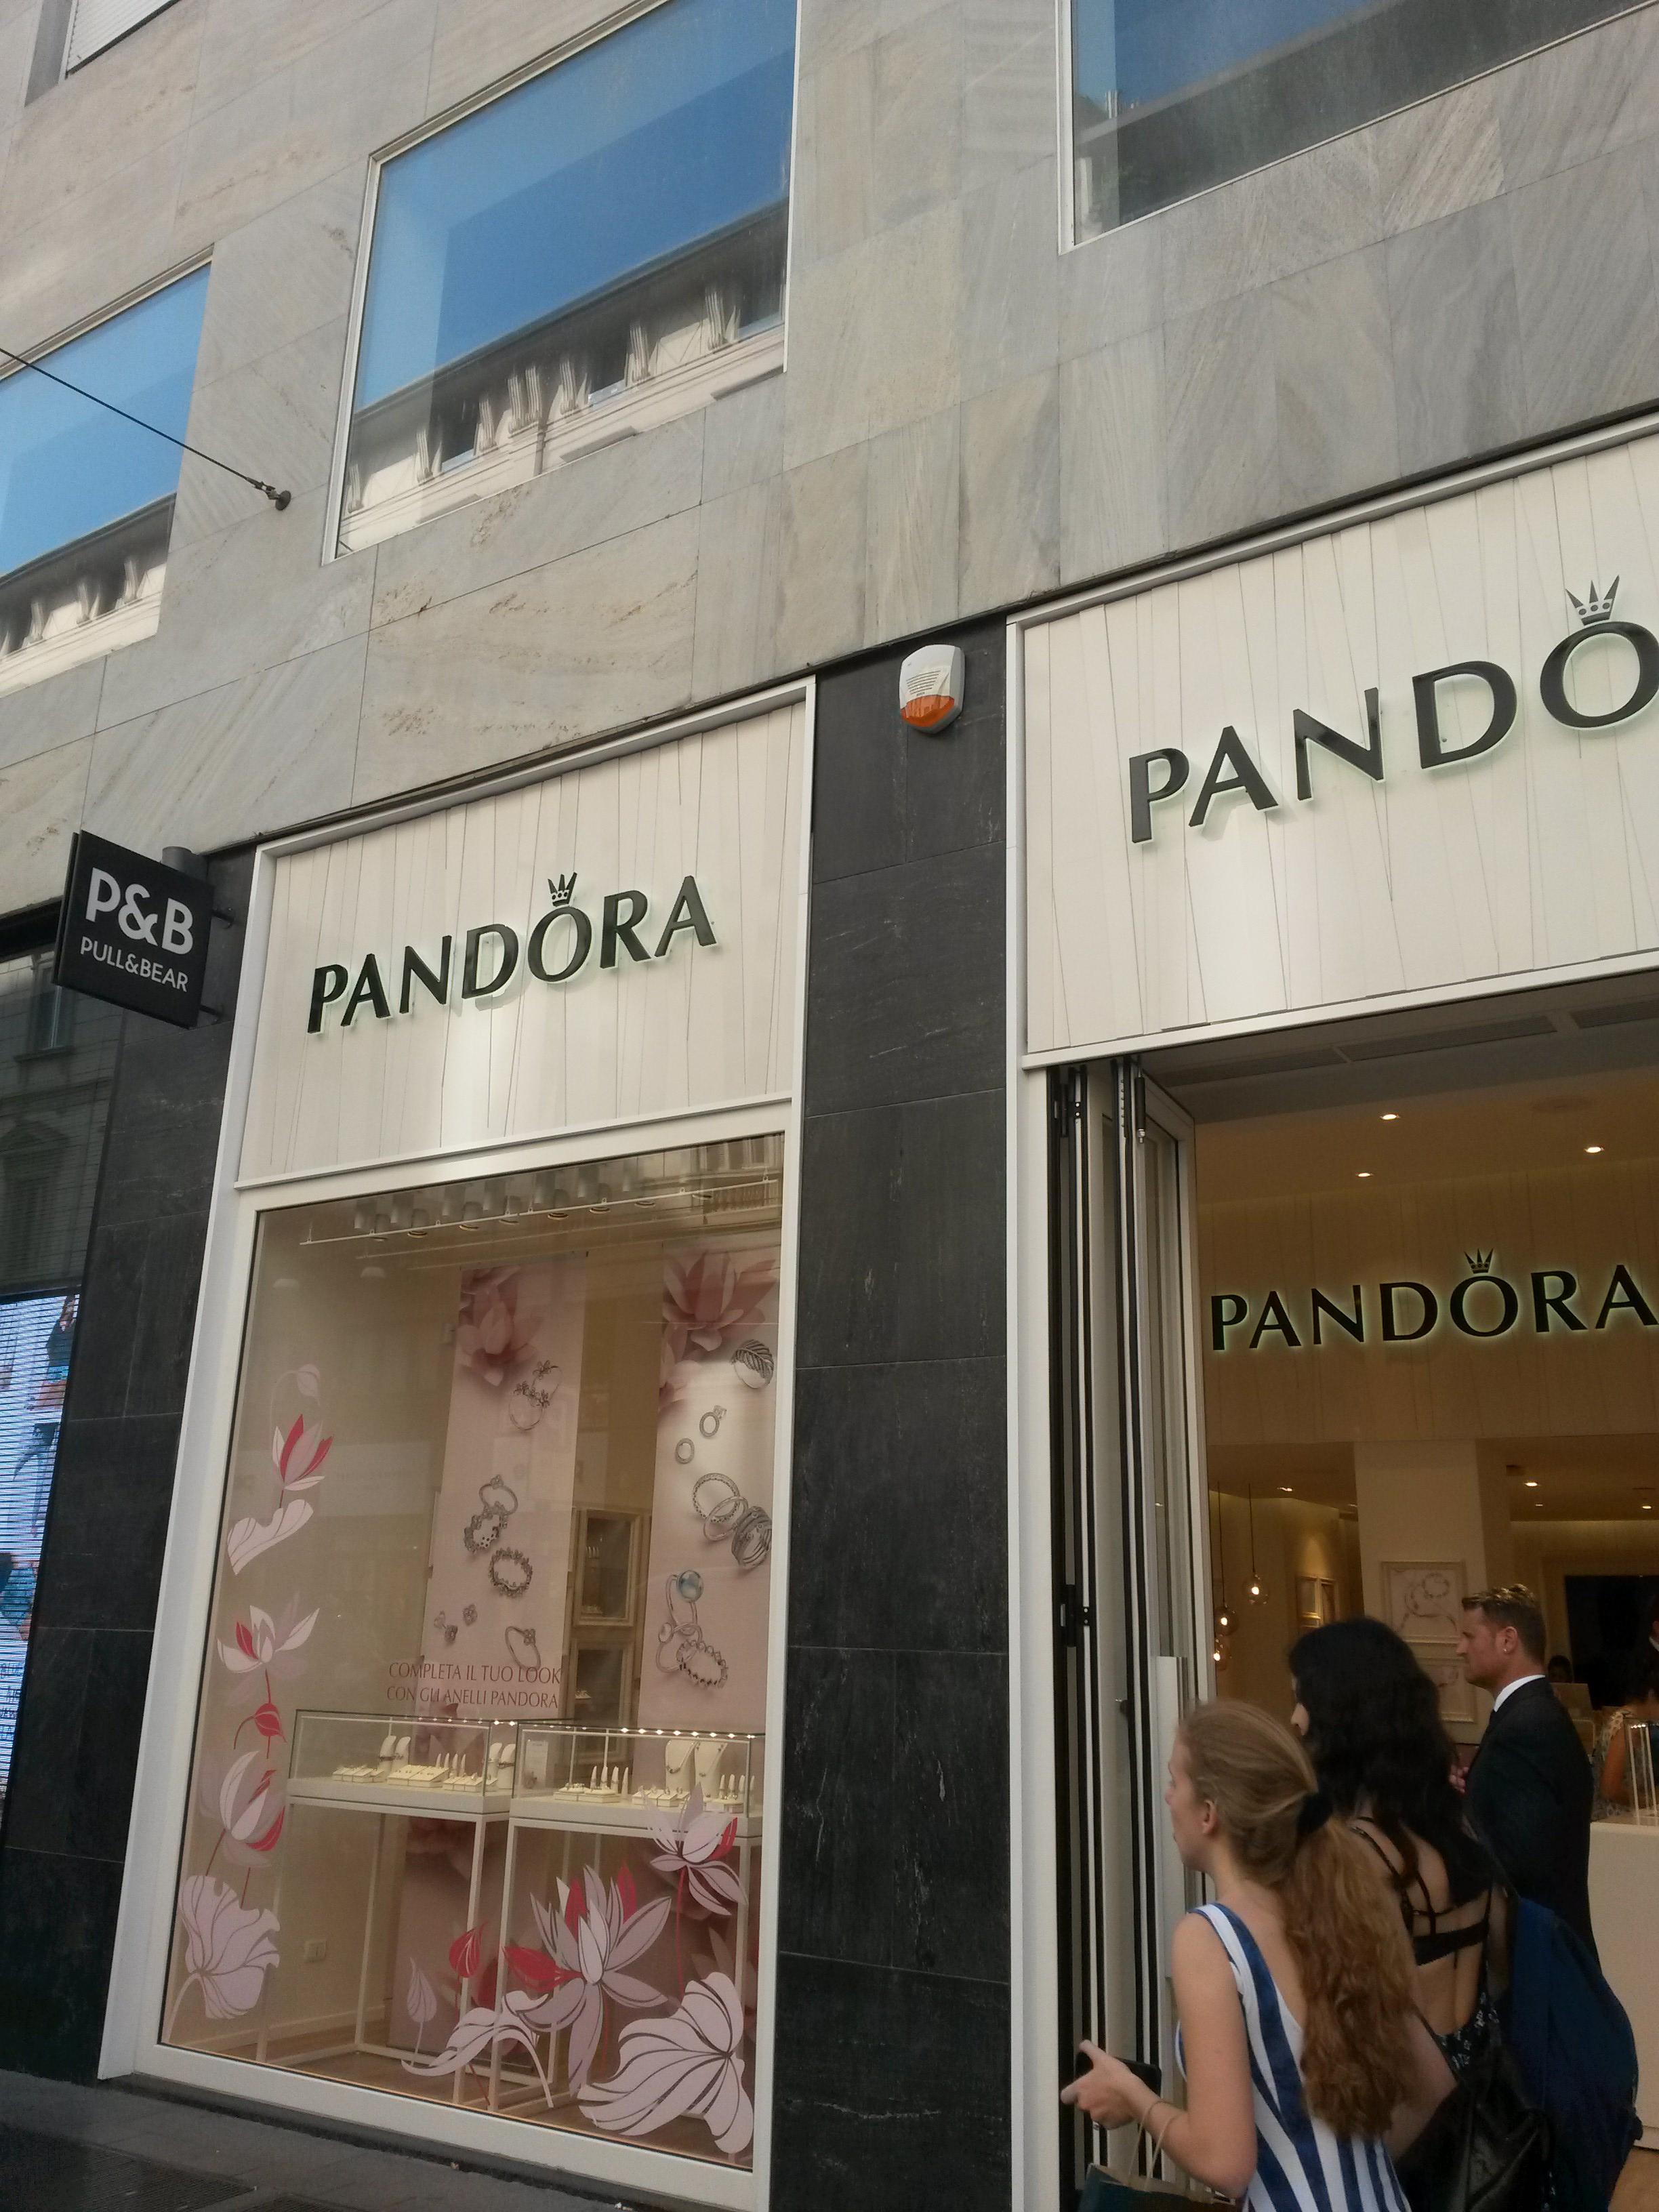 Pandora7.jpg